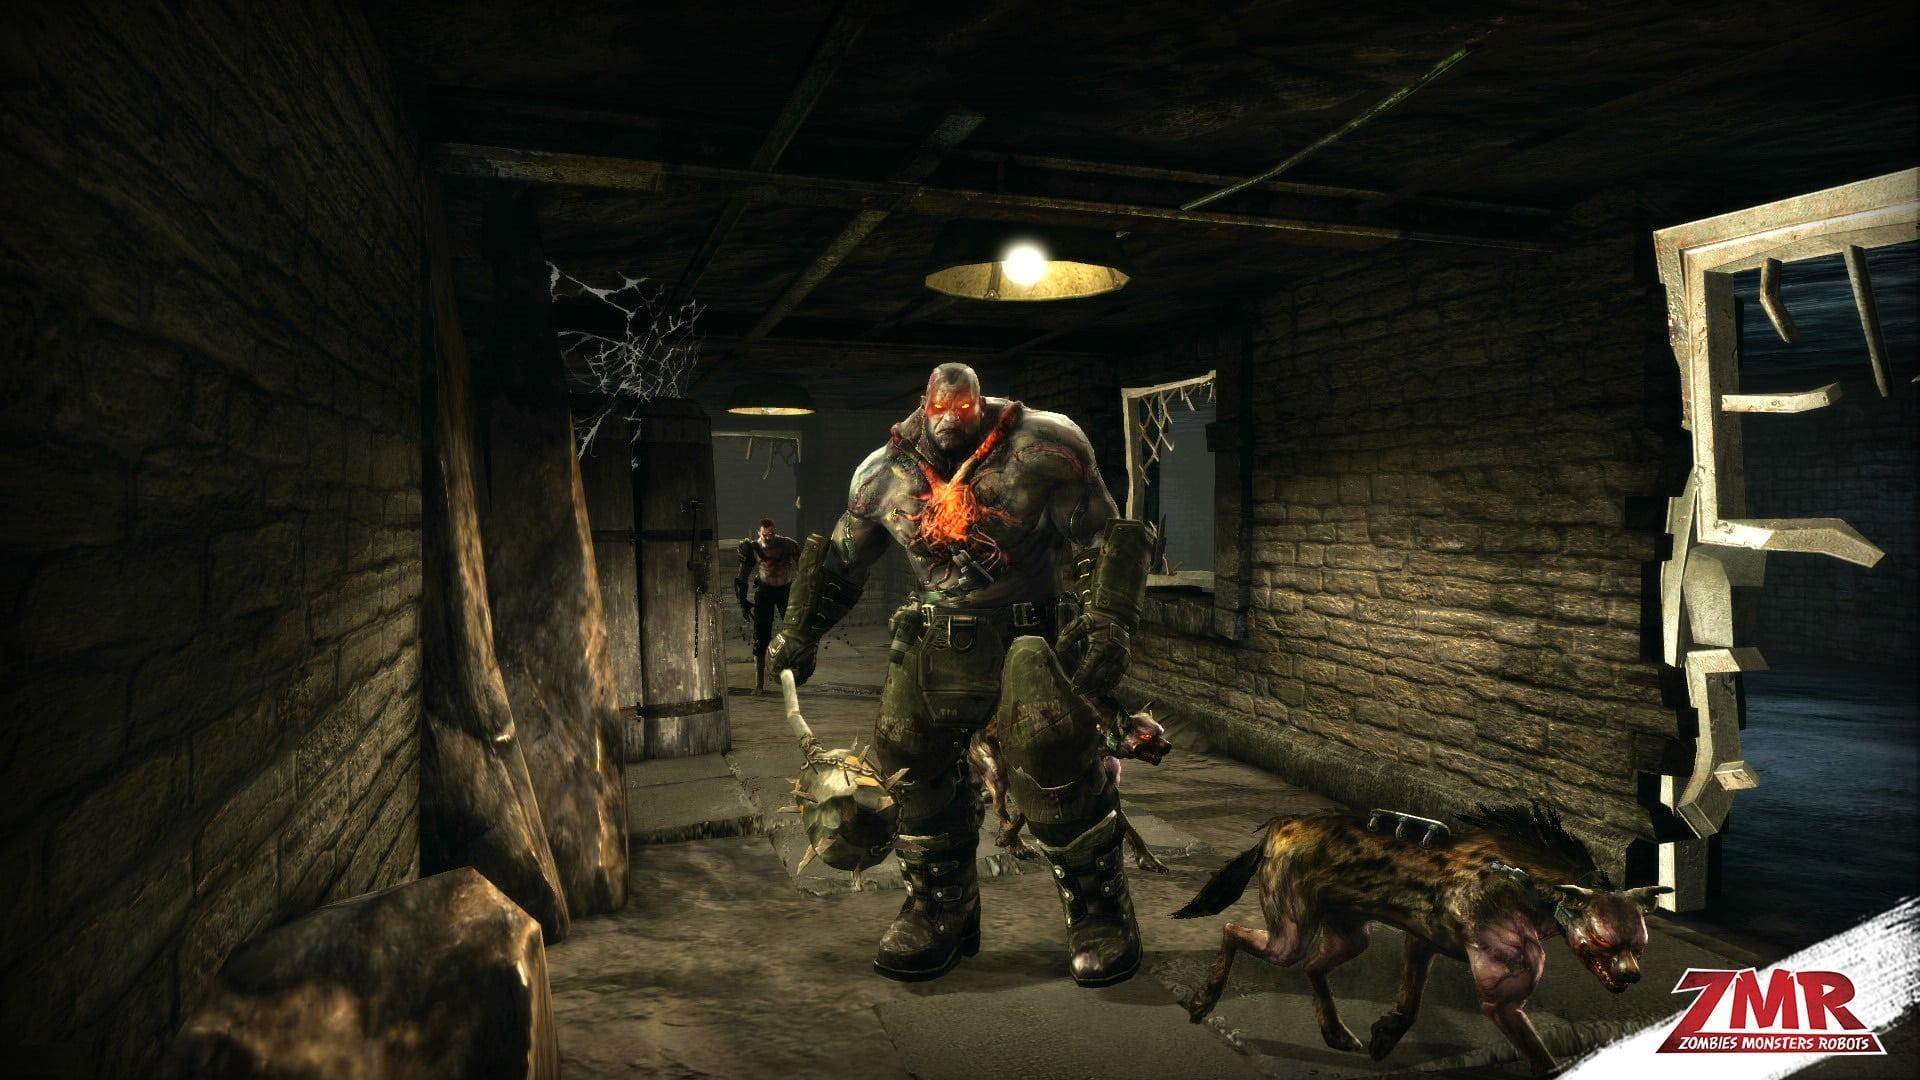 Zombies Monsters Robots - Announcement screenshot 2